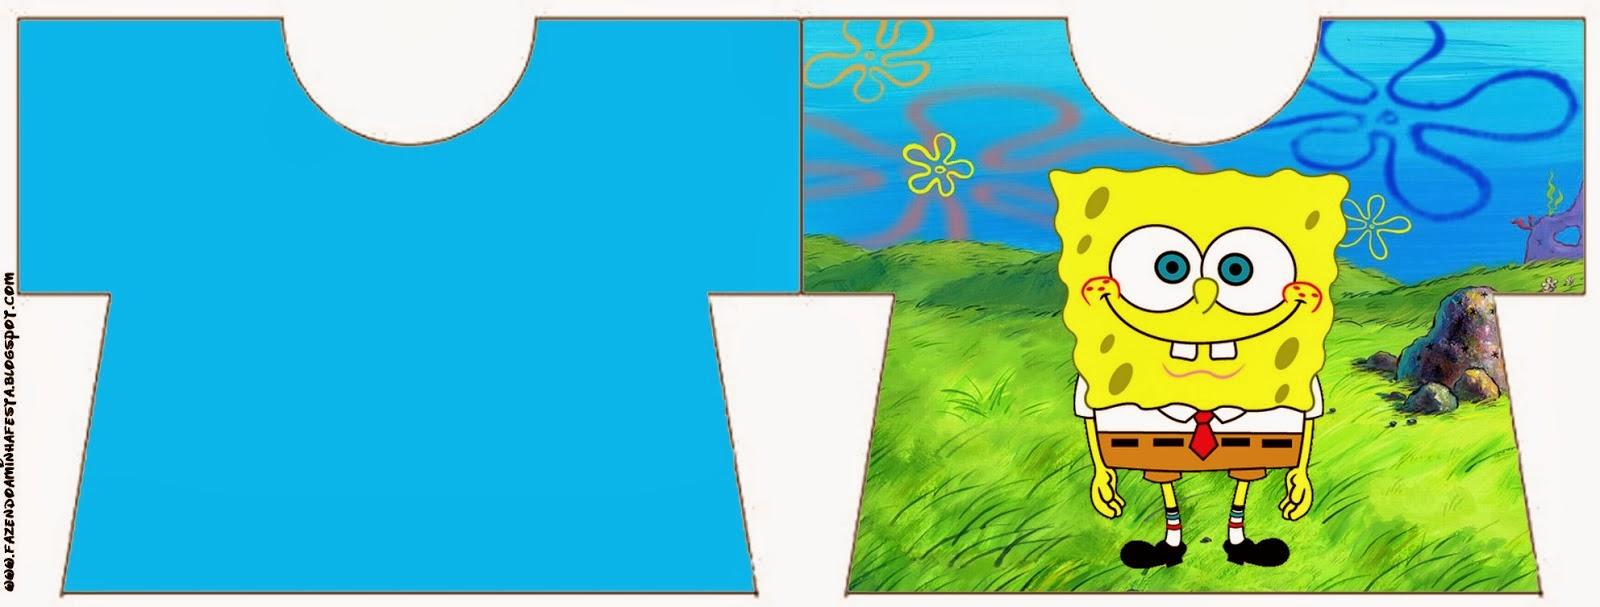 SpongeBob SquarePants Free Printable Cards And Invitations Is - Birthday invitation spongebob background